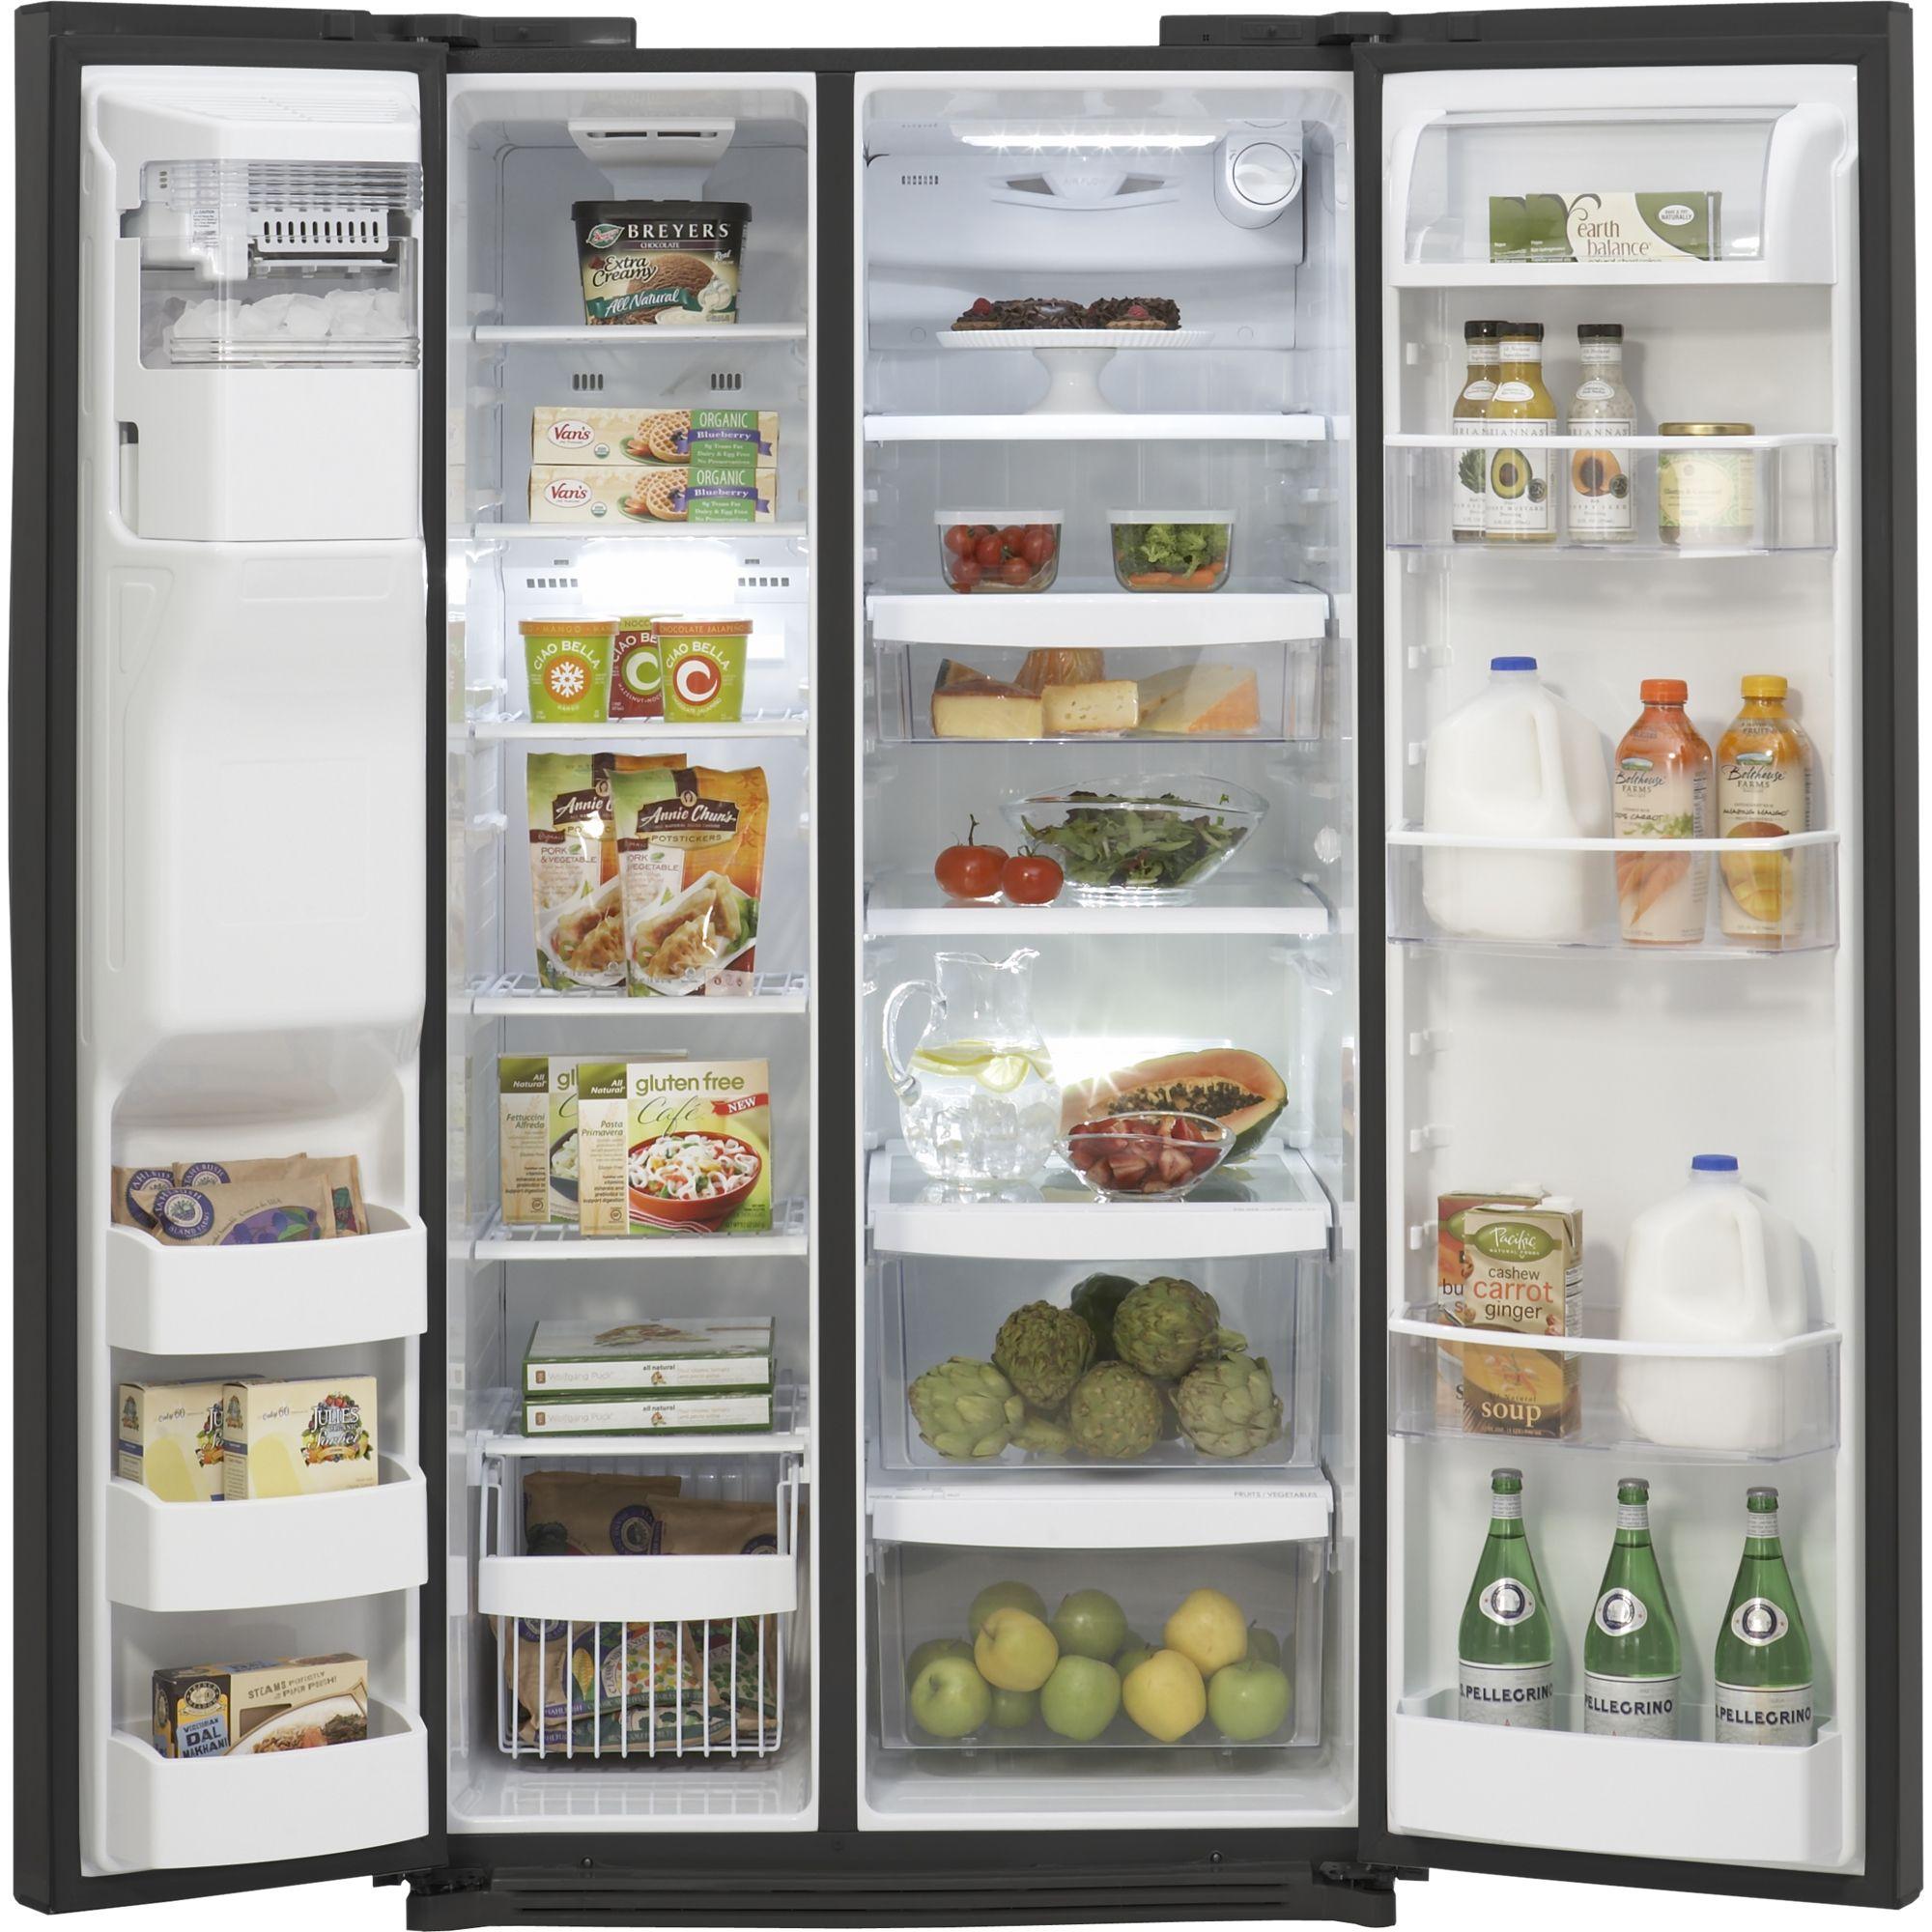 Kenmore Elite 26.5 cu. ft. Side-by-Side Refrigerator